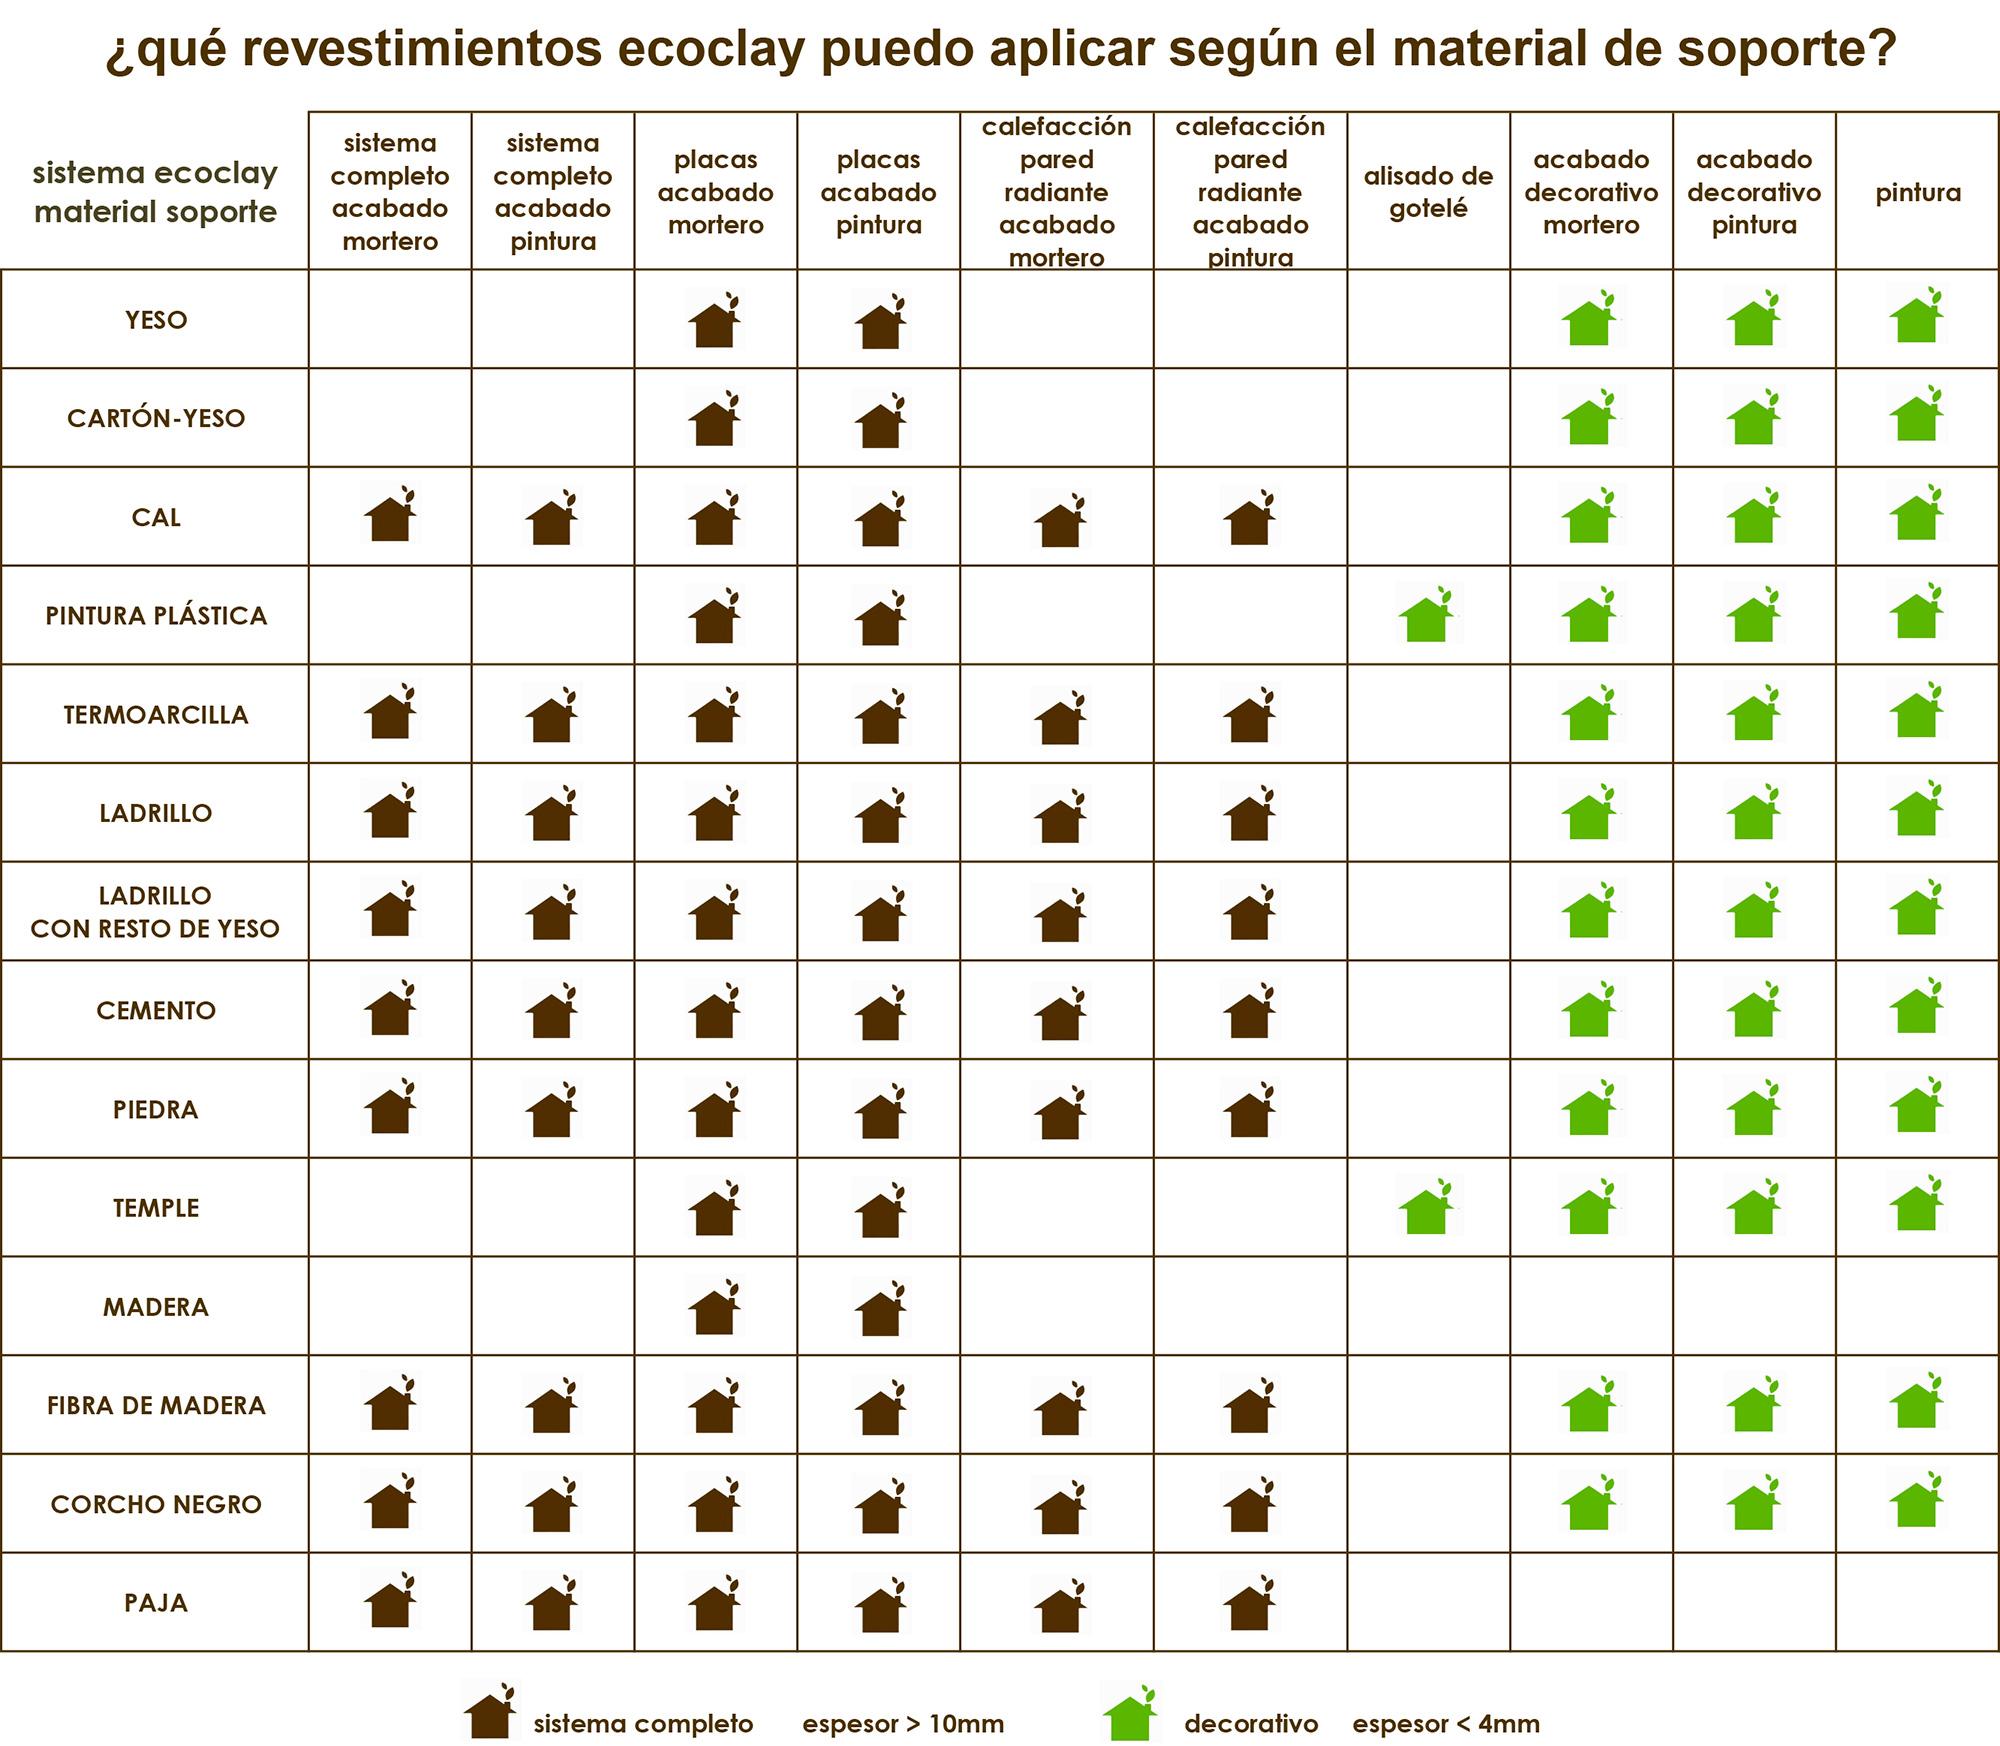 sistemas ecoclay, según soporte